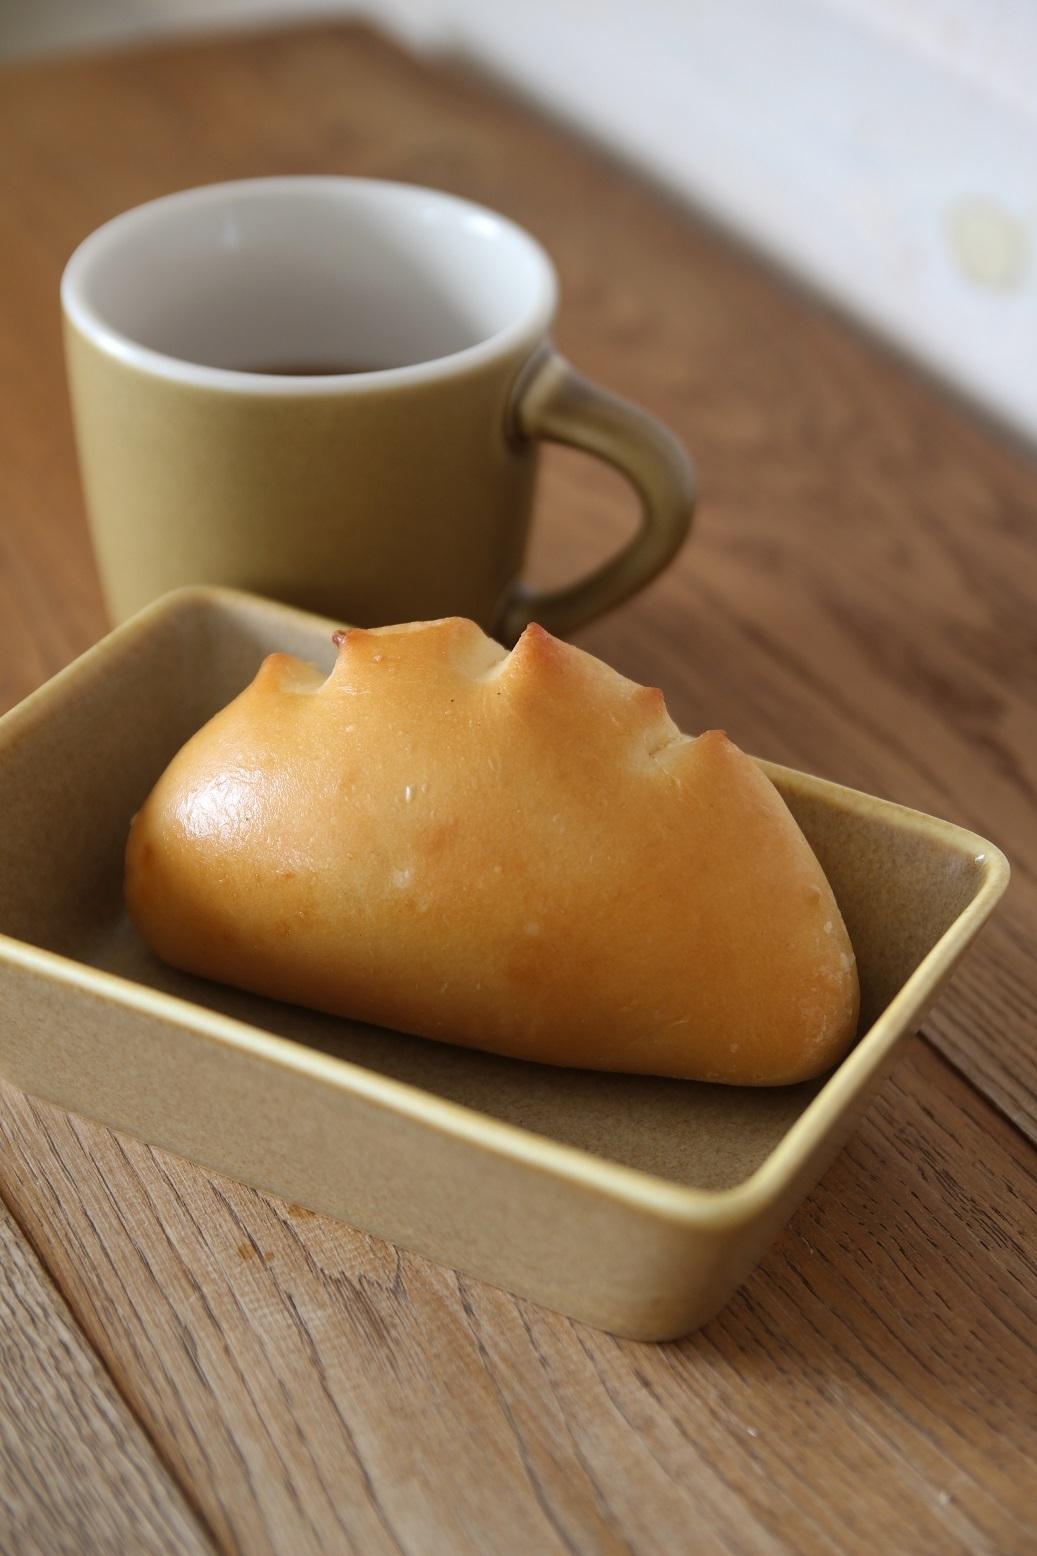 Mof-mof 自家製天然酵母 石窯パン 販売 ご予約_e0297175_13371484.jpg